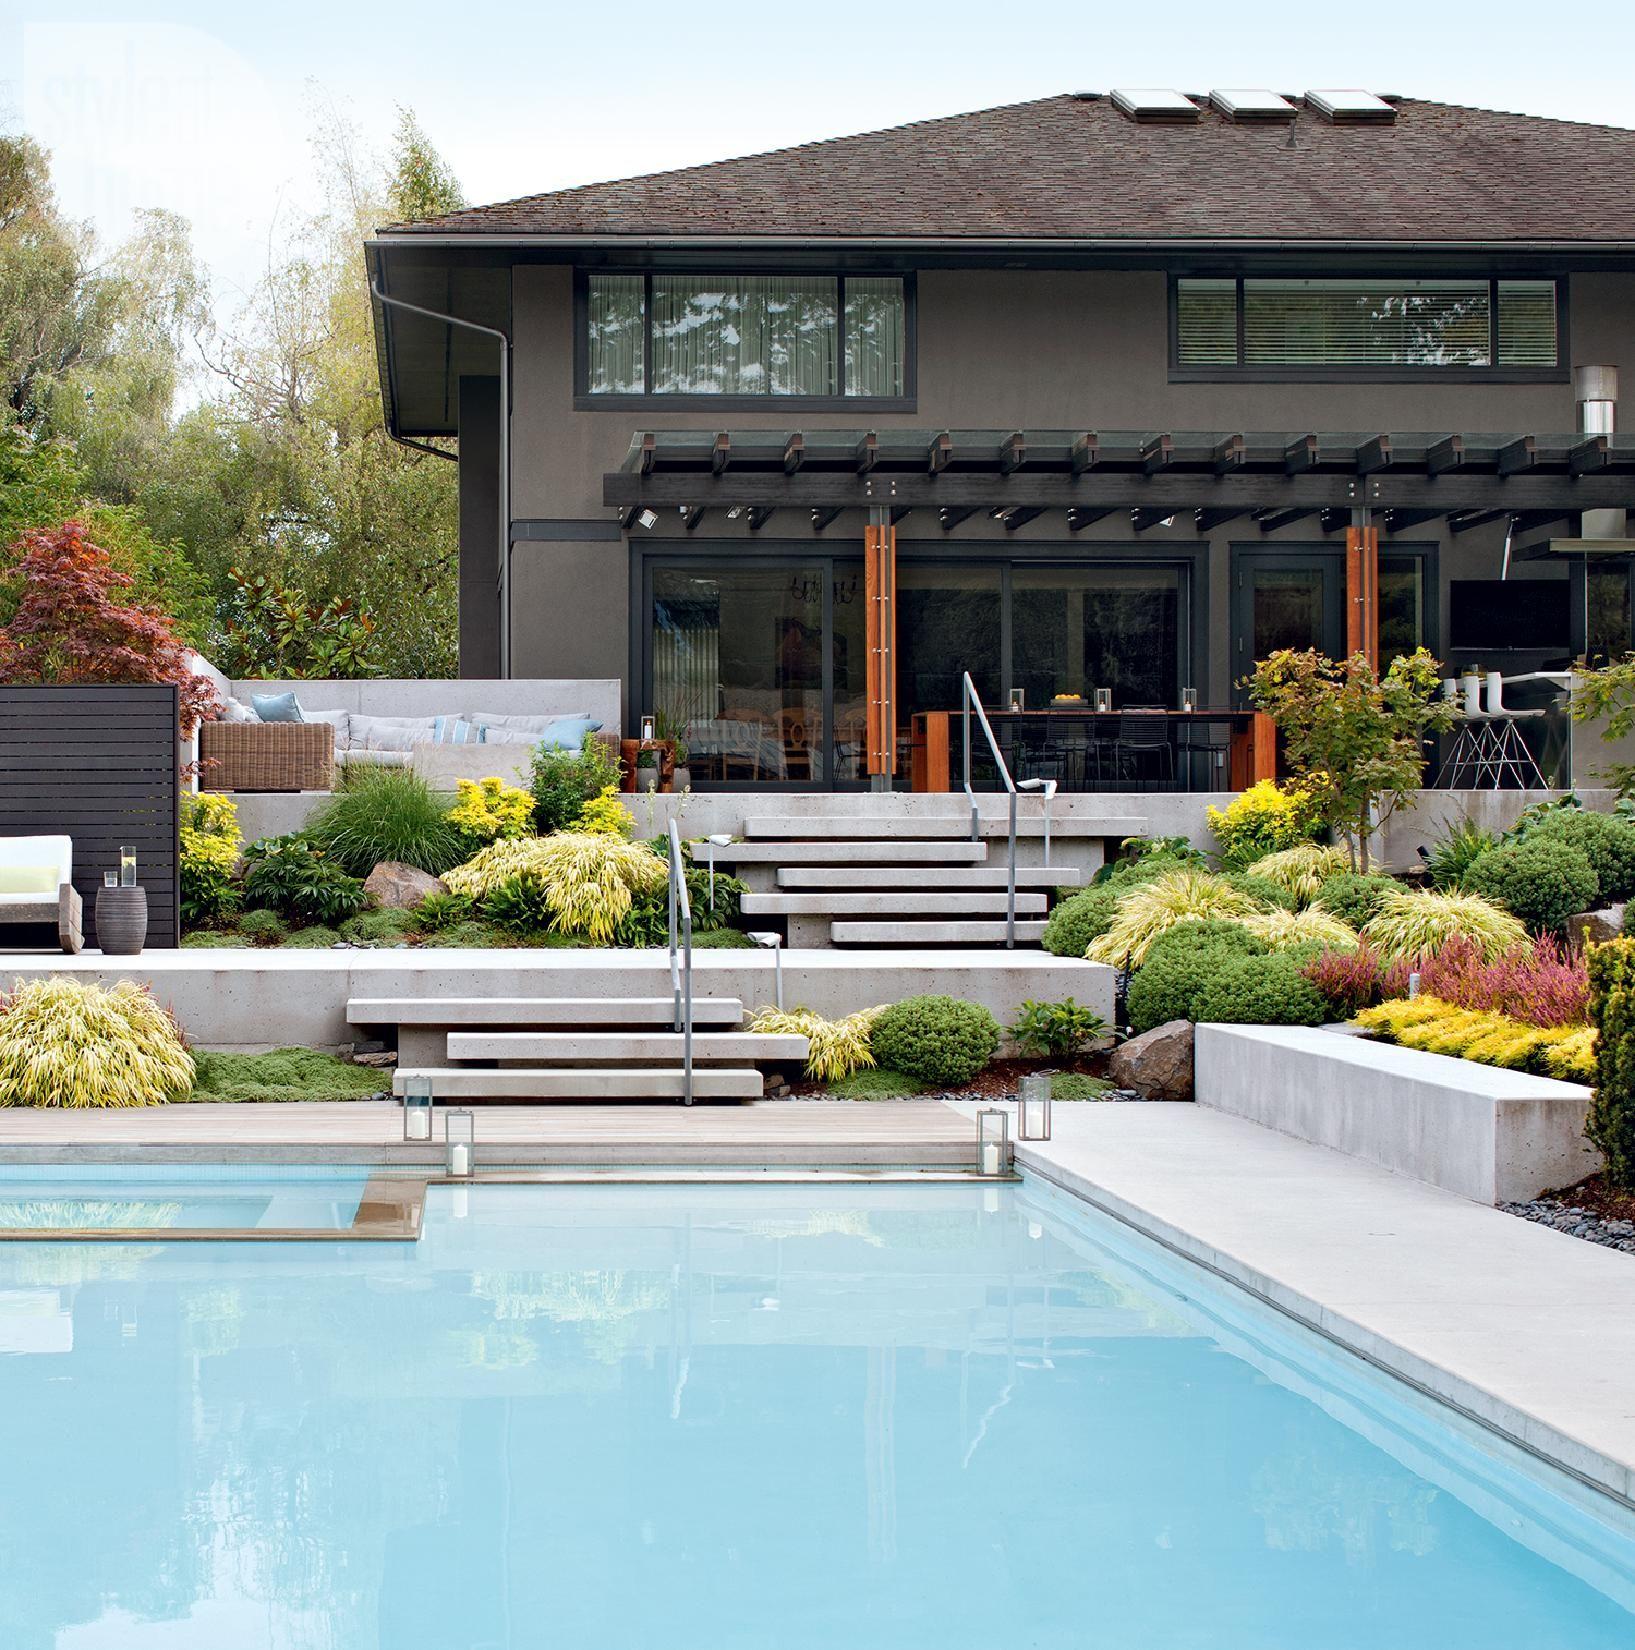 Outdoor design: Multi-functional backyard retreat in 2020 ... on Functional Backyard Ideas id=48972